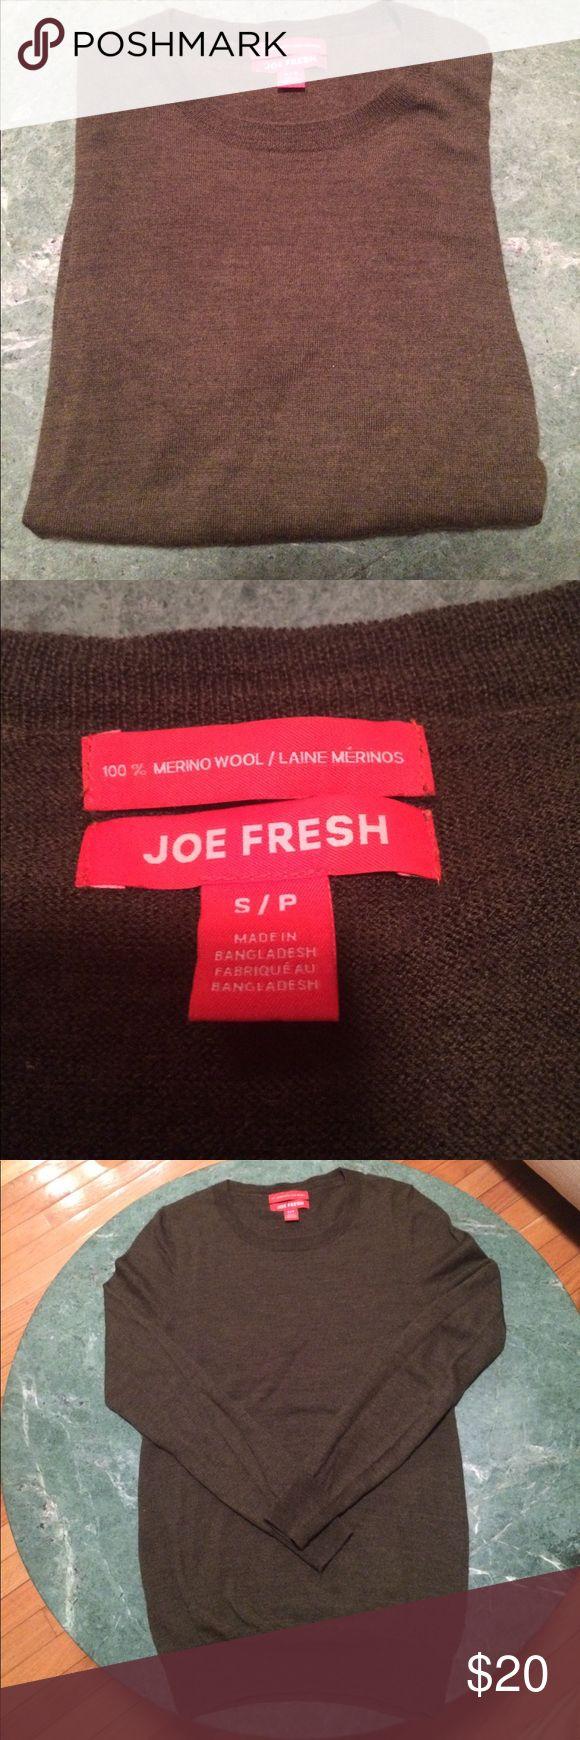 Selling this Joe Fresh Army Green Cardigan | Size Small on Poshmark! My username is: myedenlife. #shopmycloset #poshmark #fashion #shopping #style #forsale #Joe Fresh #Sweaters